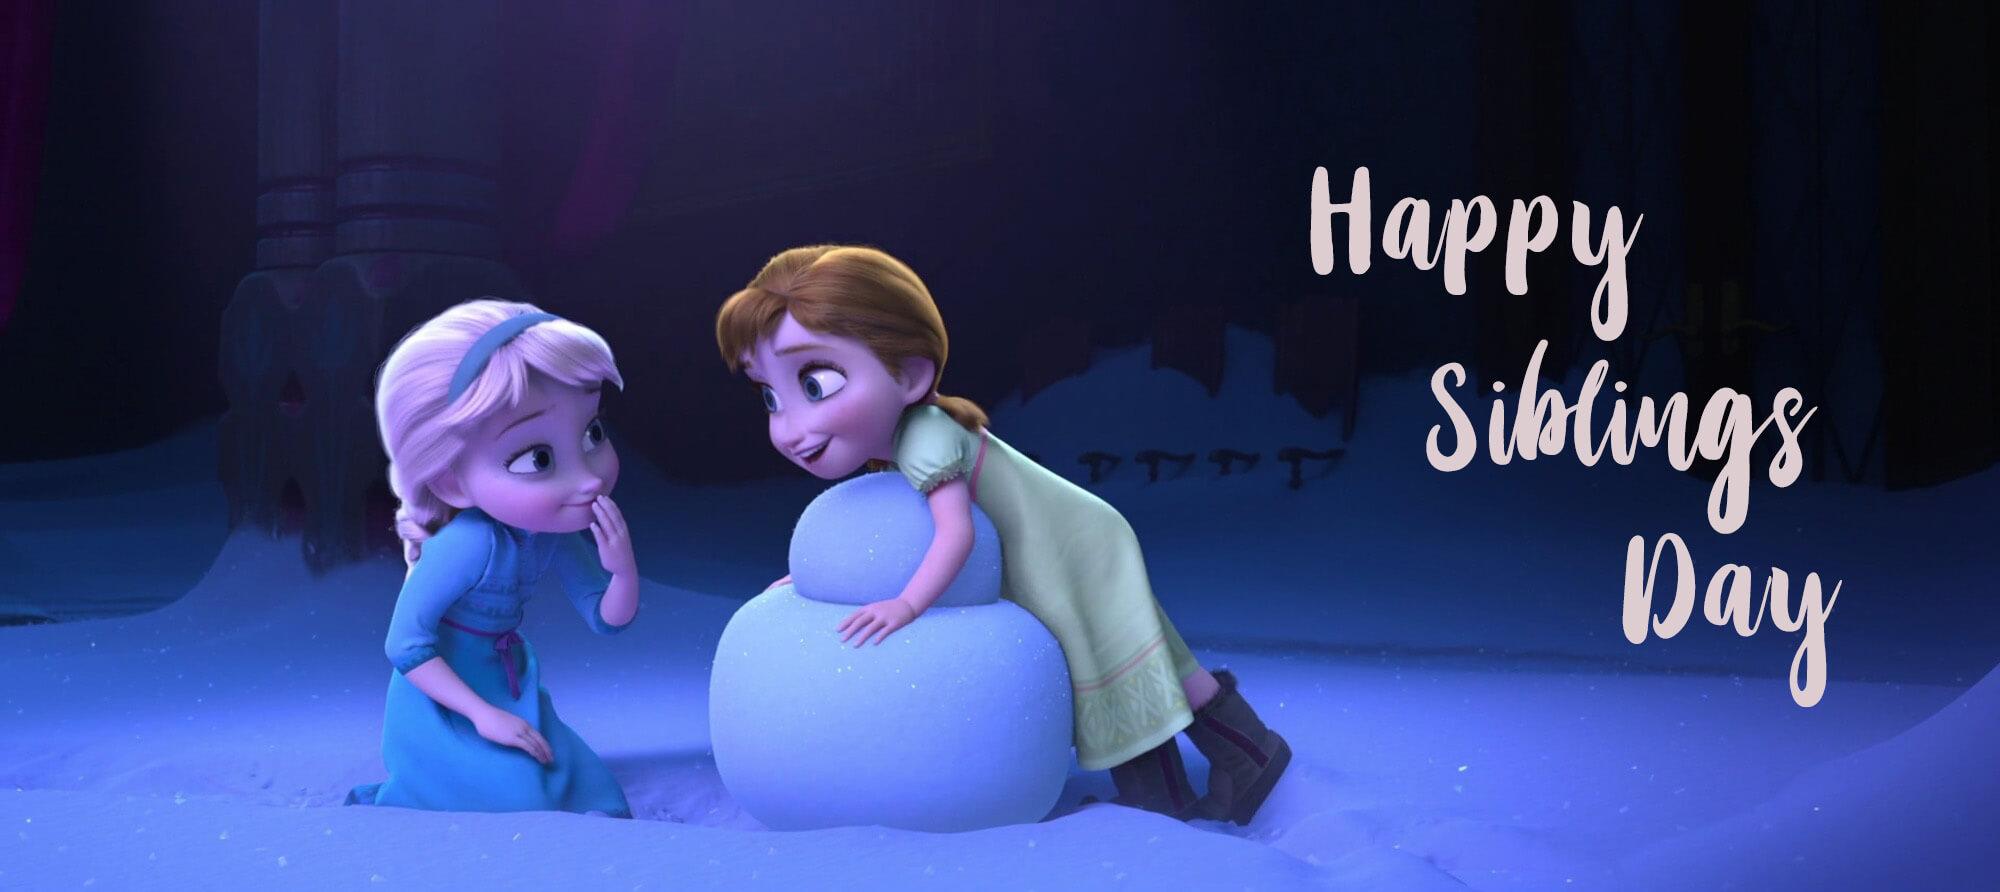 happy national siblings day anna elsa sisters kids frozen hd wallpaper